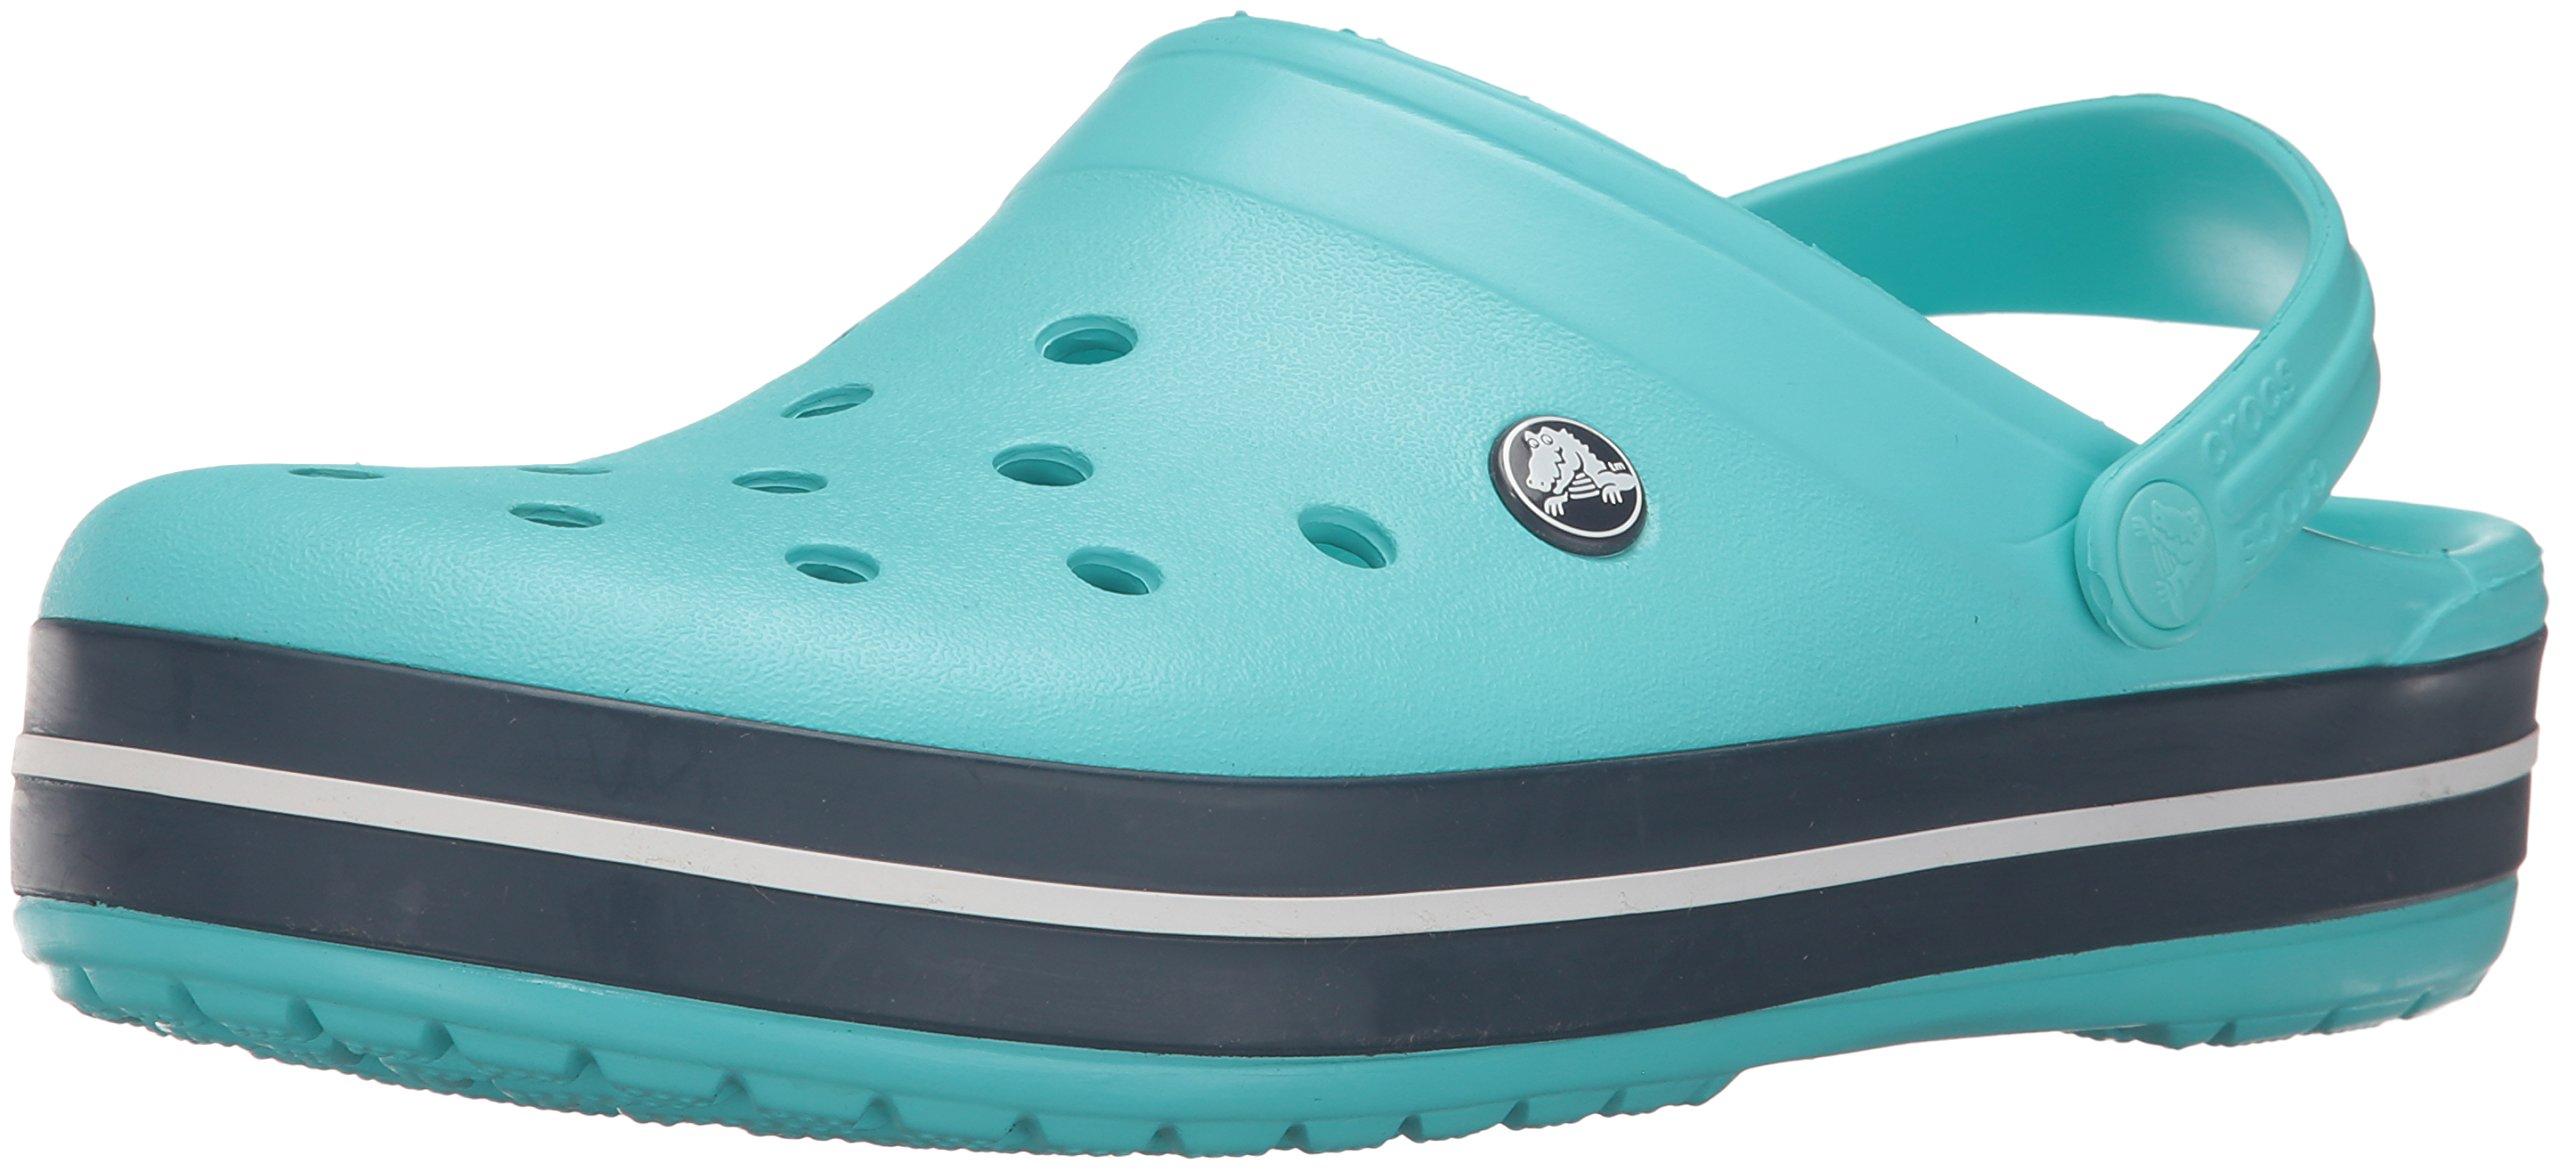 crocs Unisex Crocband Clog, Pool/Navy, 8 US Men / 10 US Women